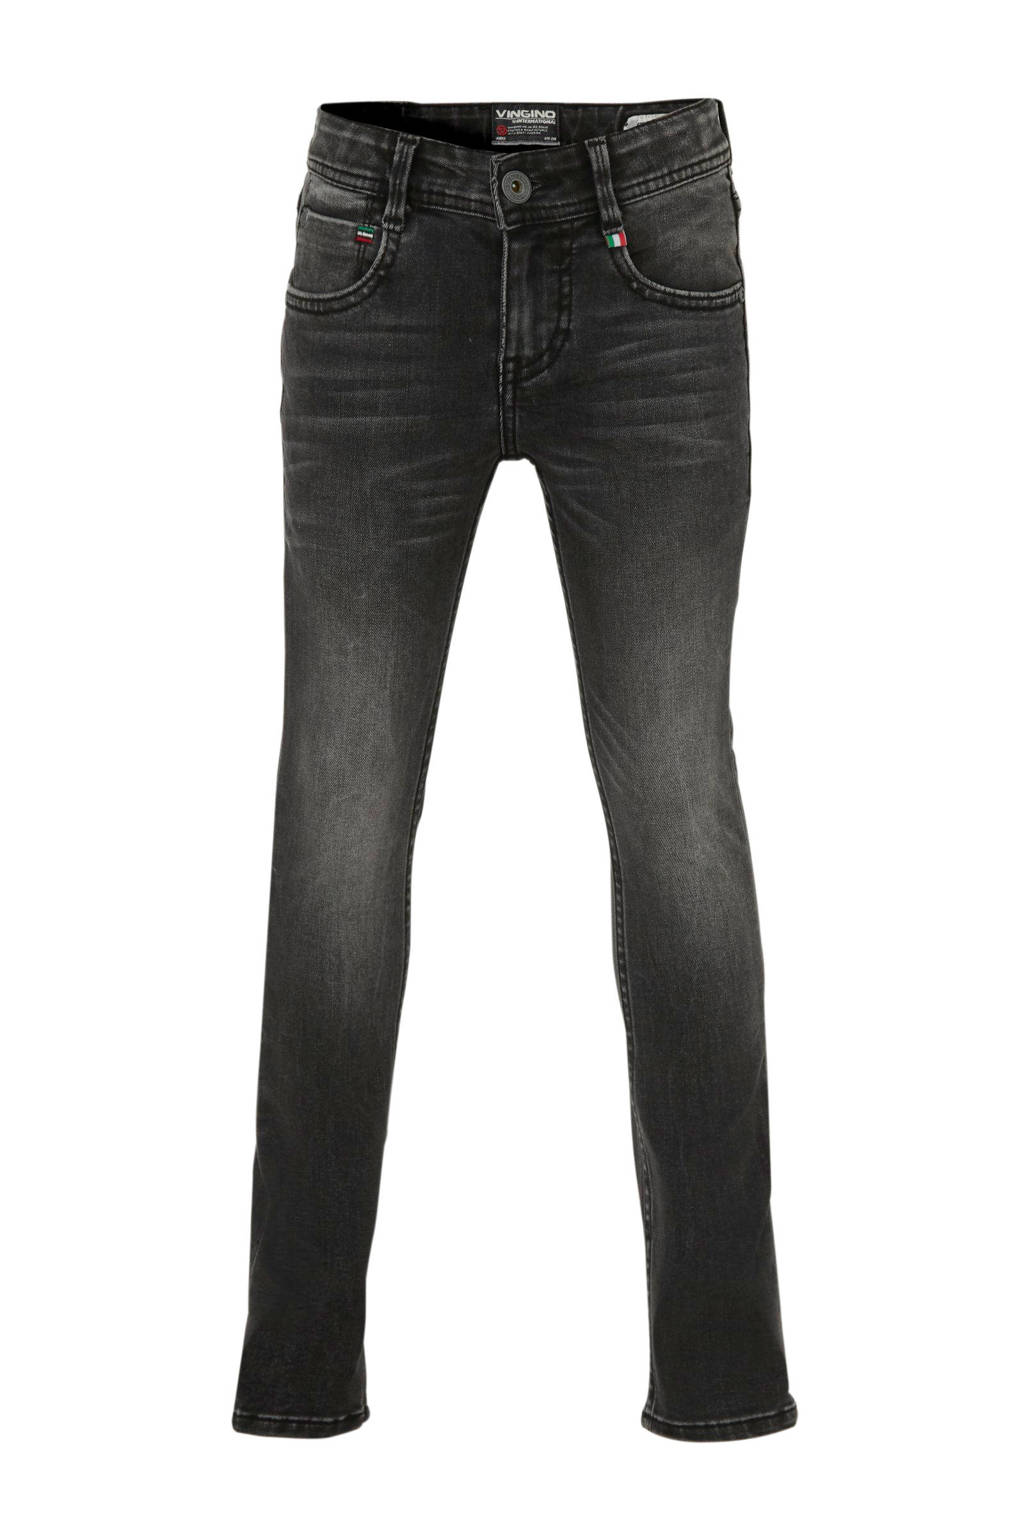 Vingino skinny jeans Argile donkergrijs, Donkergrijs